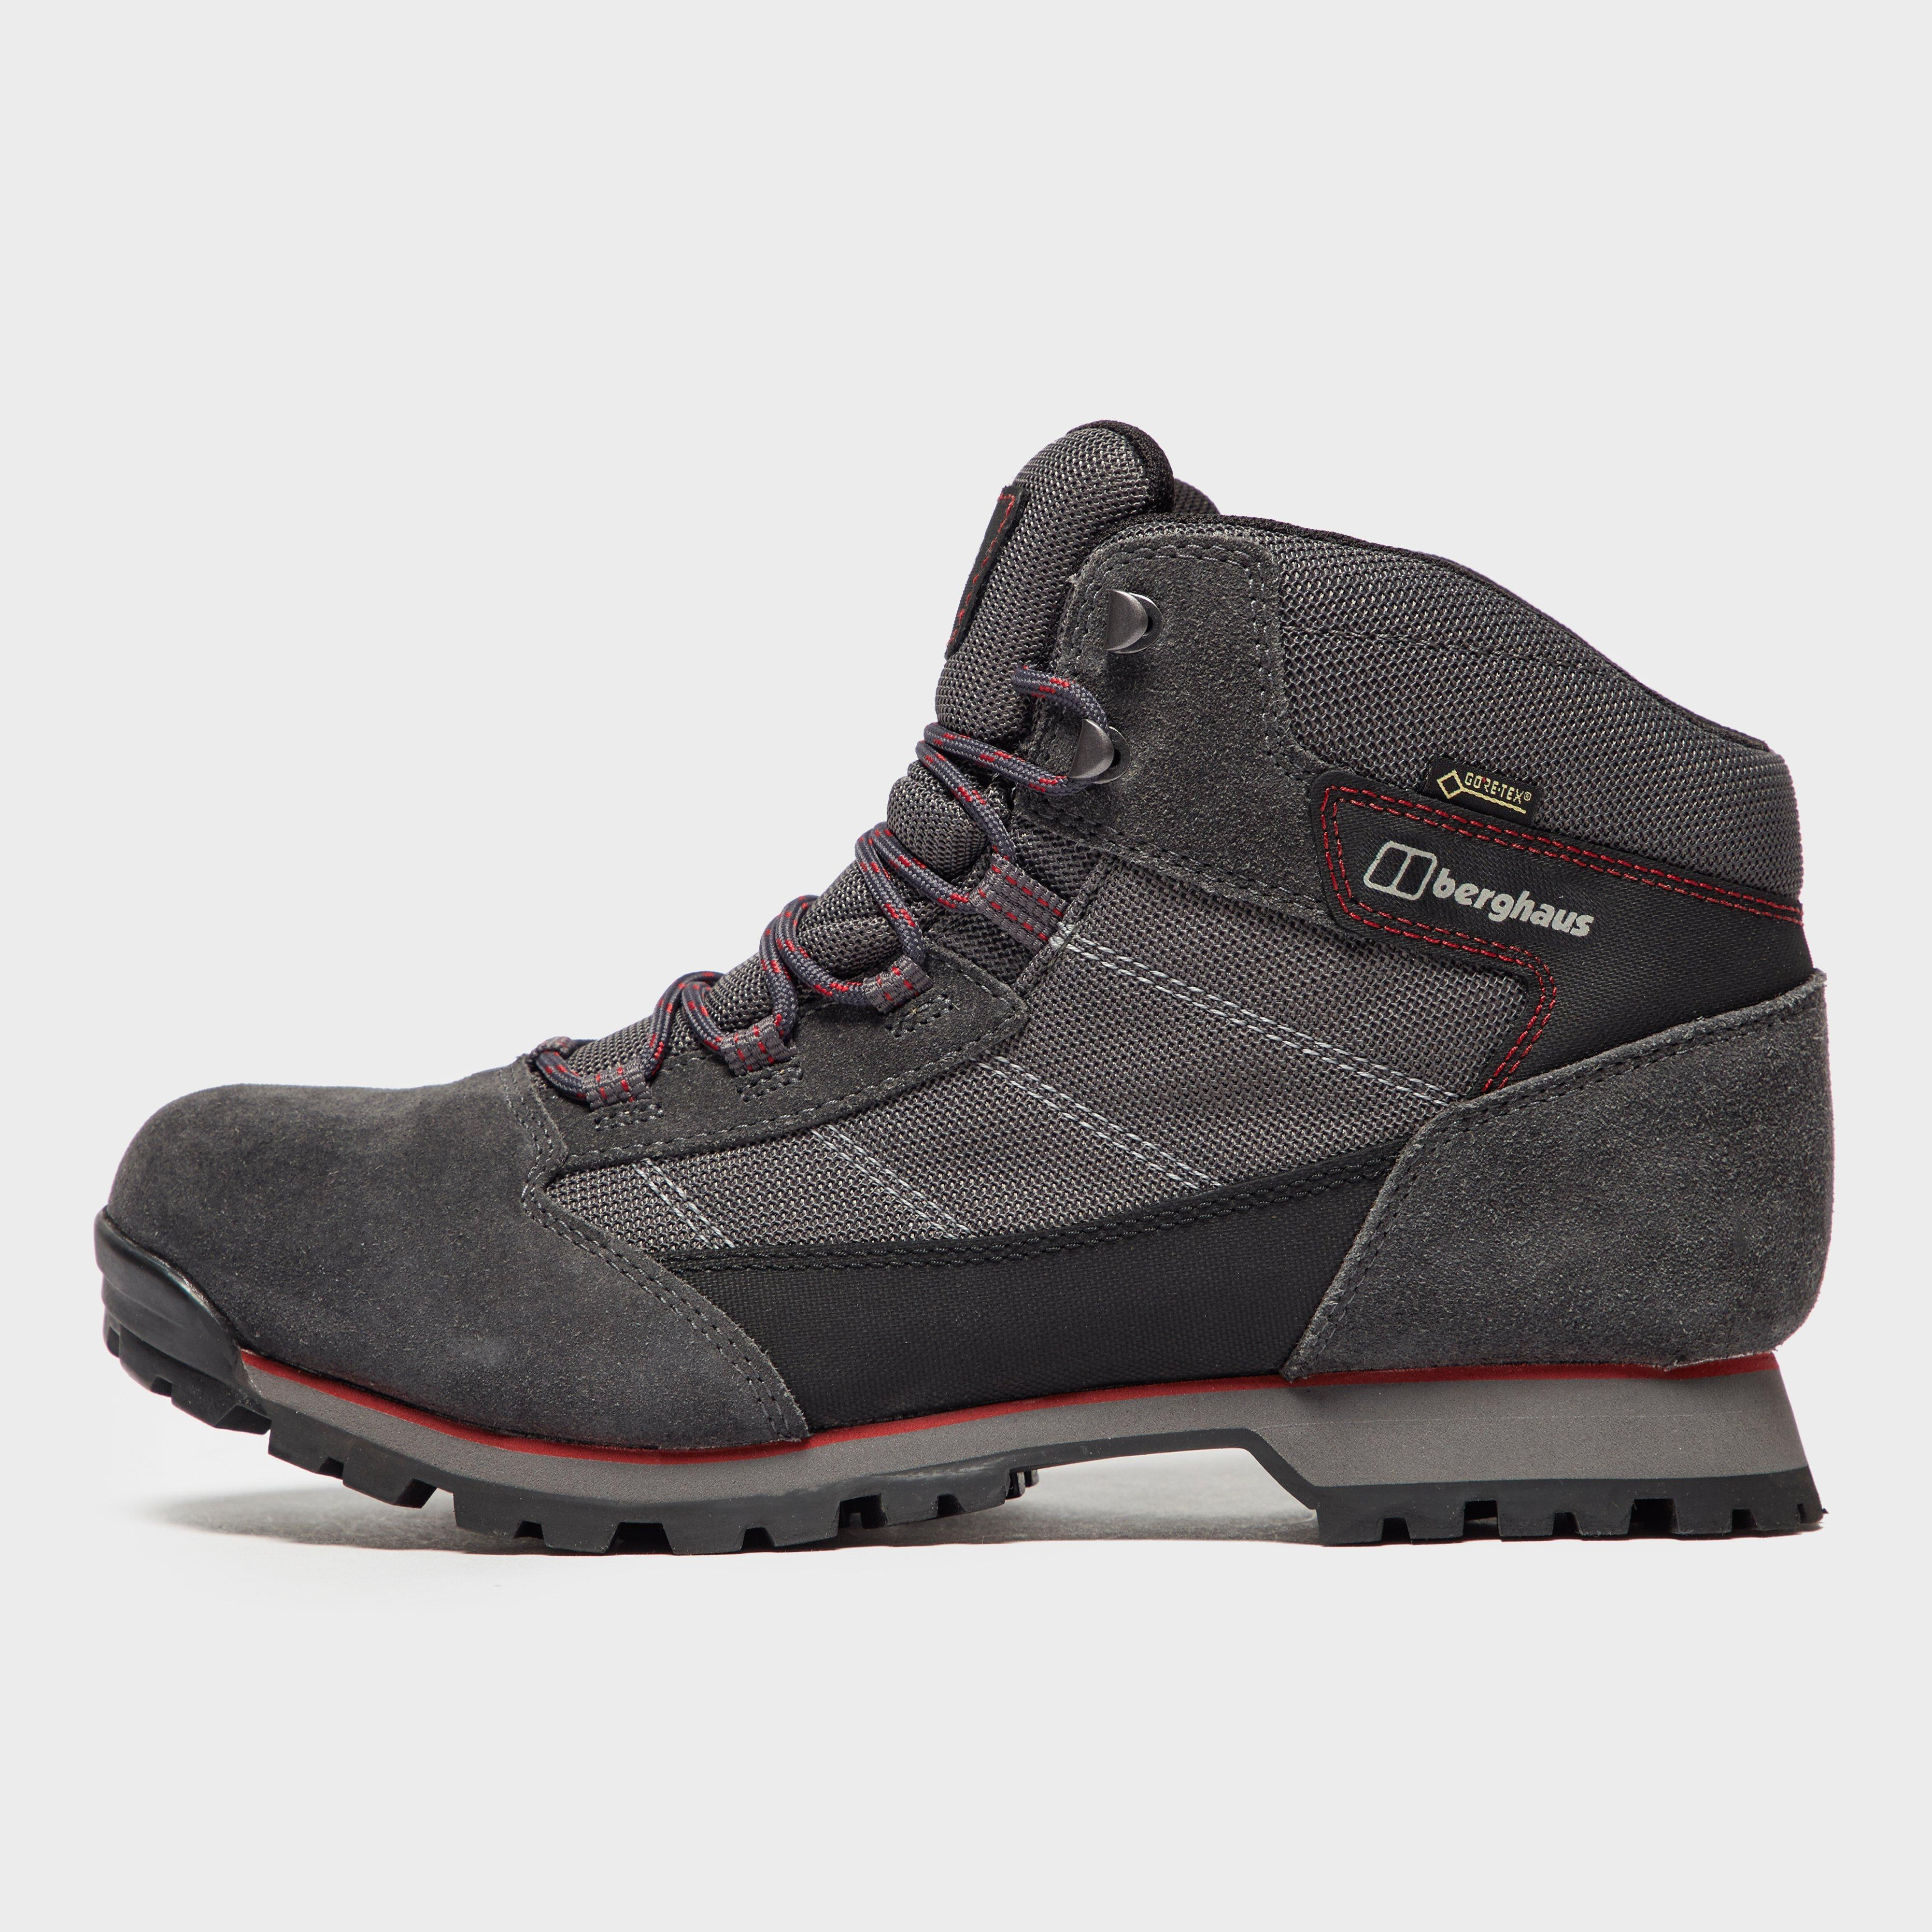 Berghaus Mens Baltra Trek Gore-tex  Walking Boots - Black/blk  Black/blk